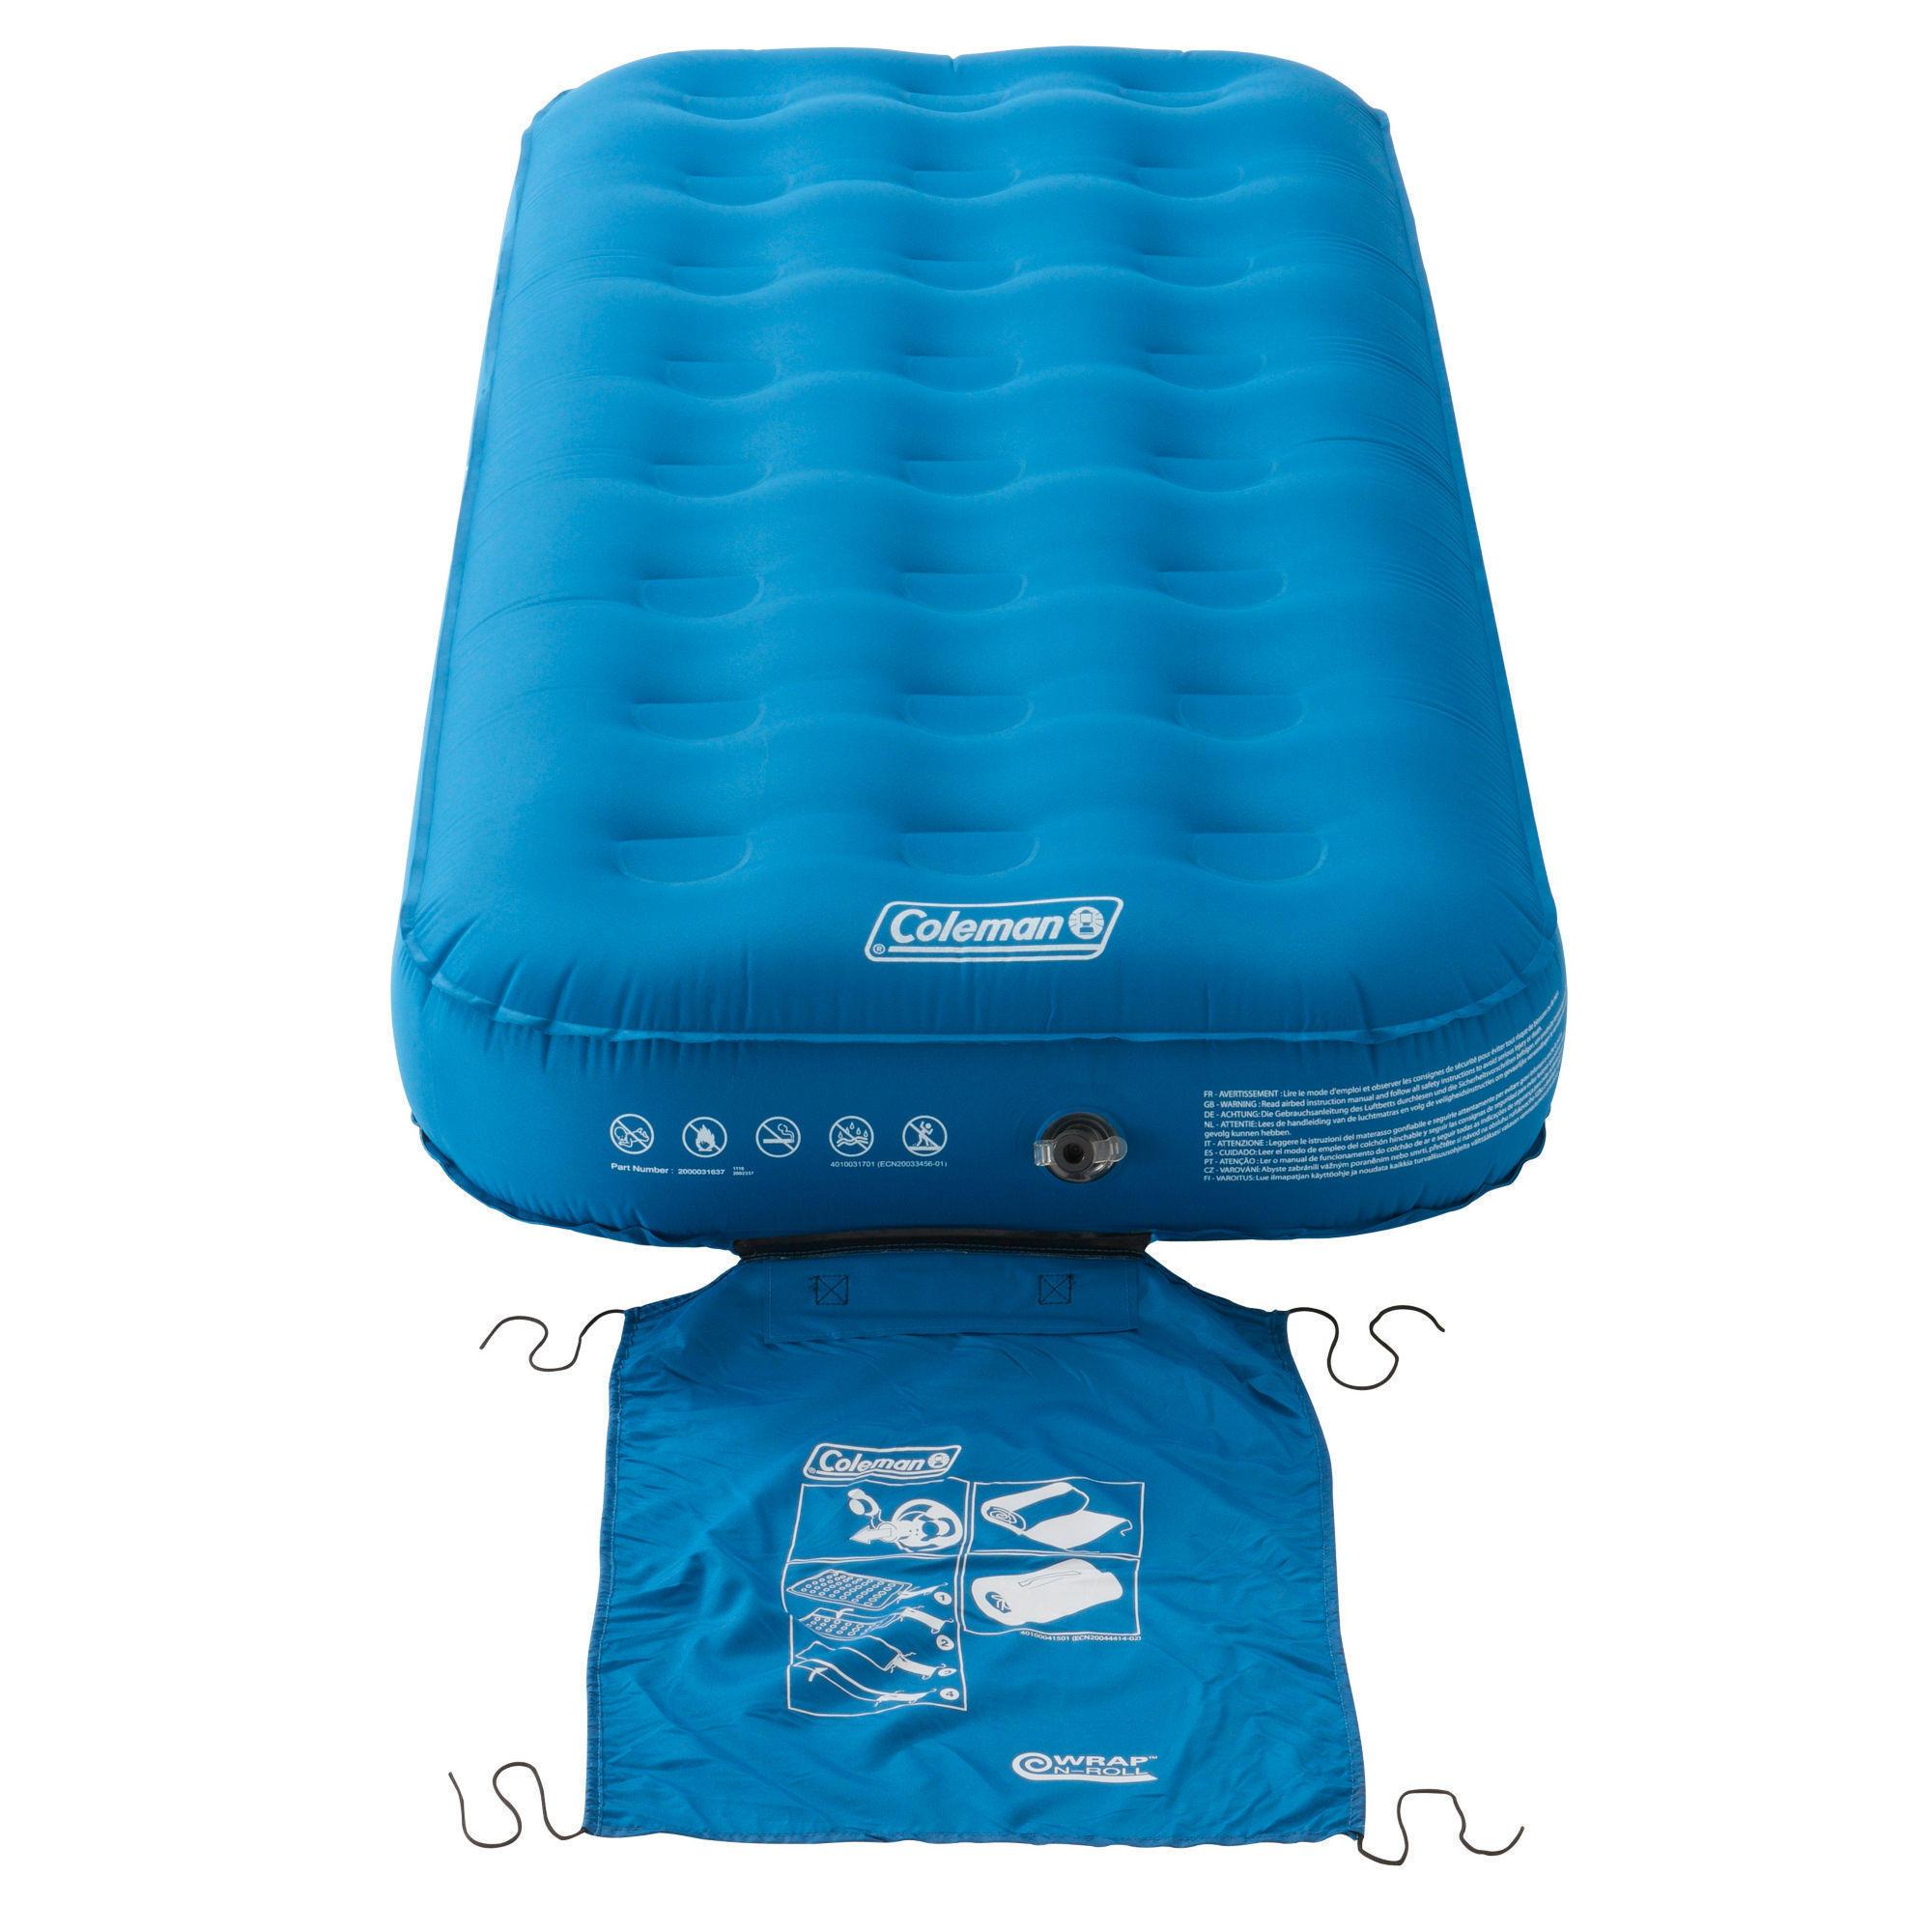 Matelas Gonflable De Camping - Extra Durable Airbed 82 Cm - 1 Personne dedans Matelas Gonflable Piscine Decathlon